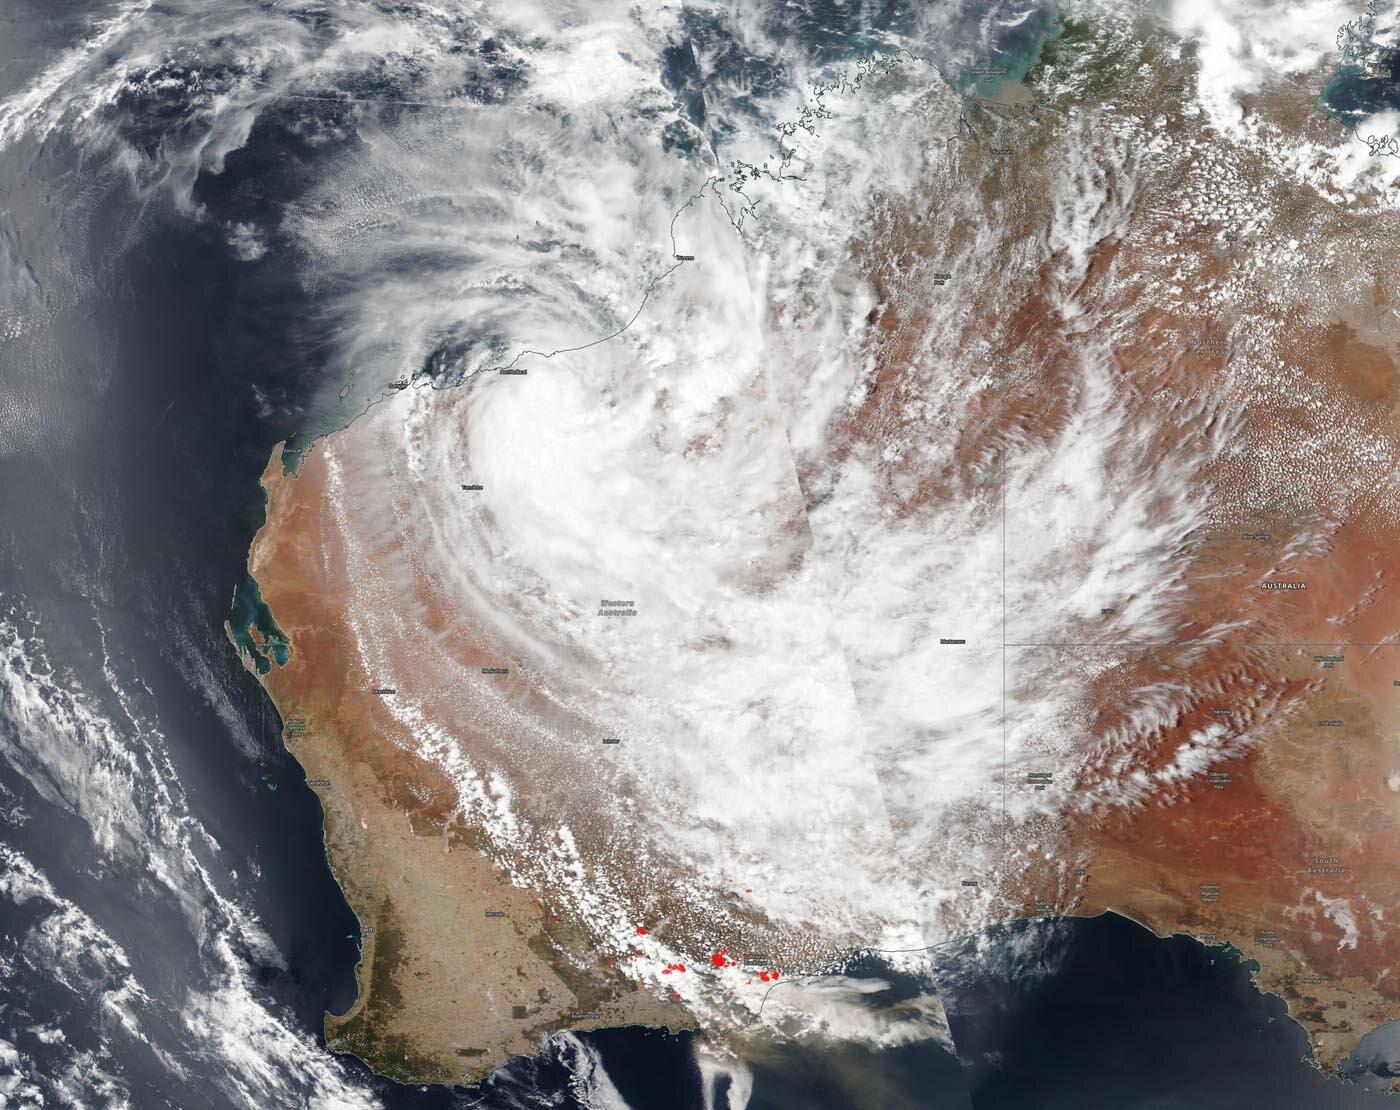 Nasa Noaa Satellite Catches Tropical Cyclone Blake And Western Australia Fires